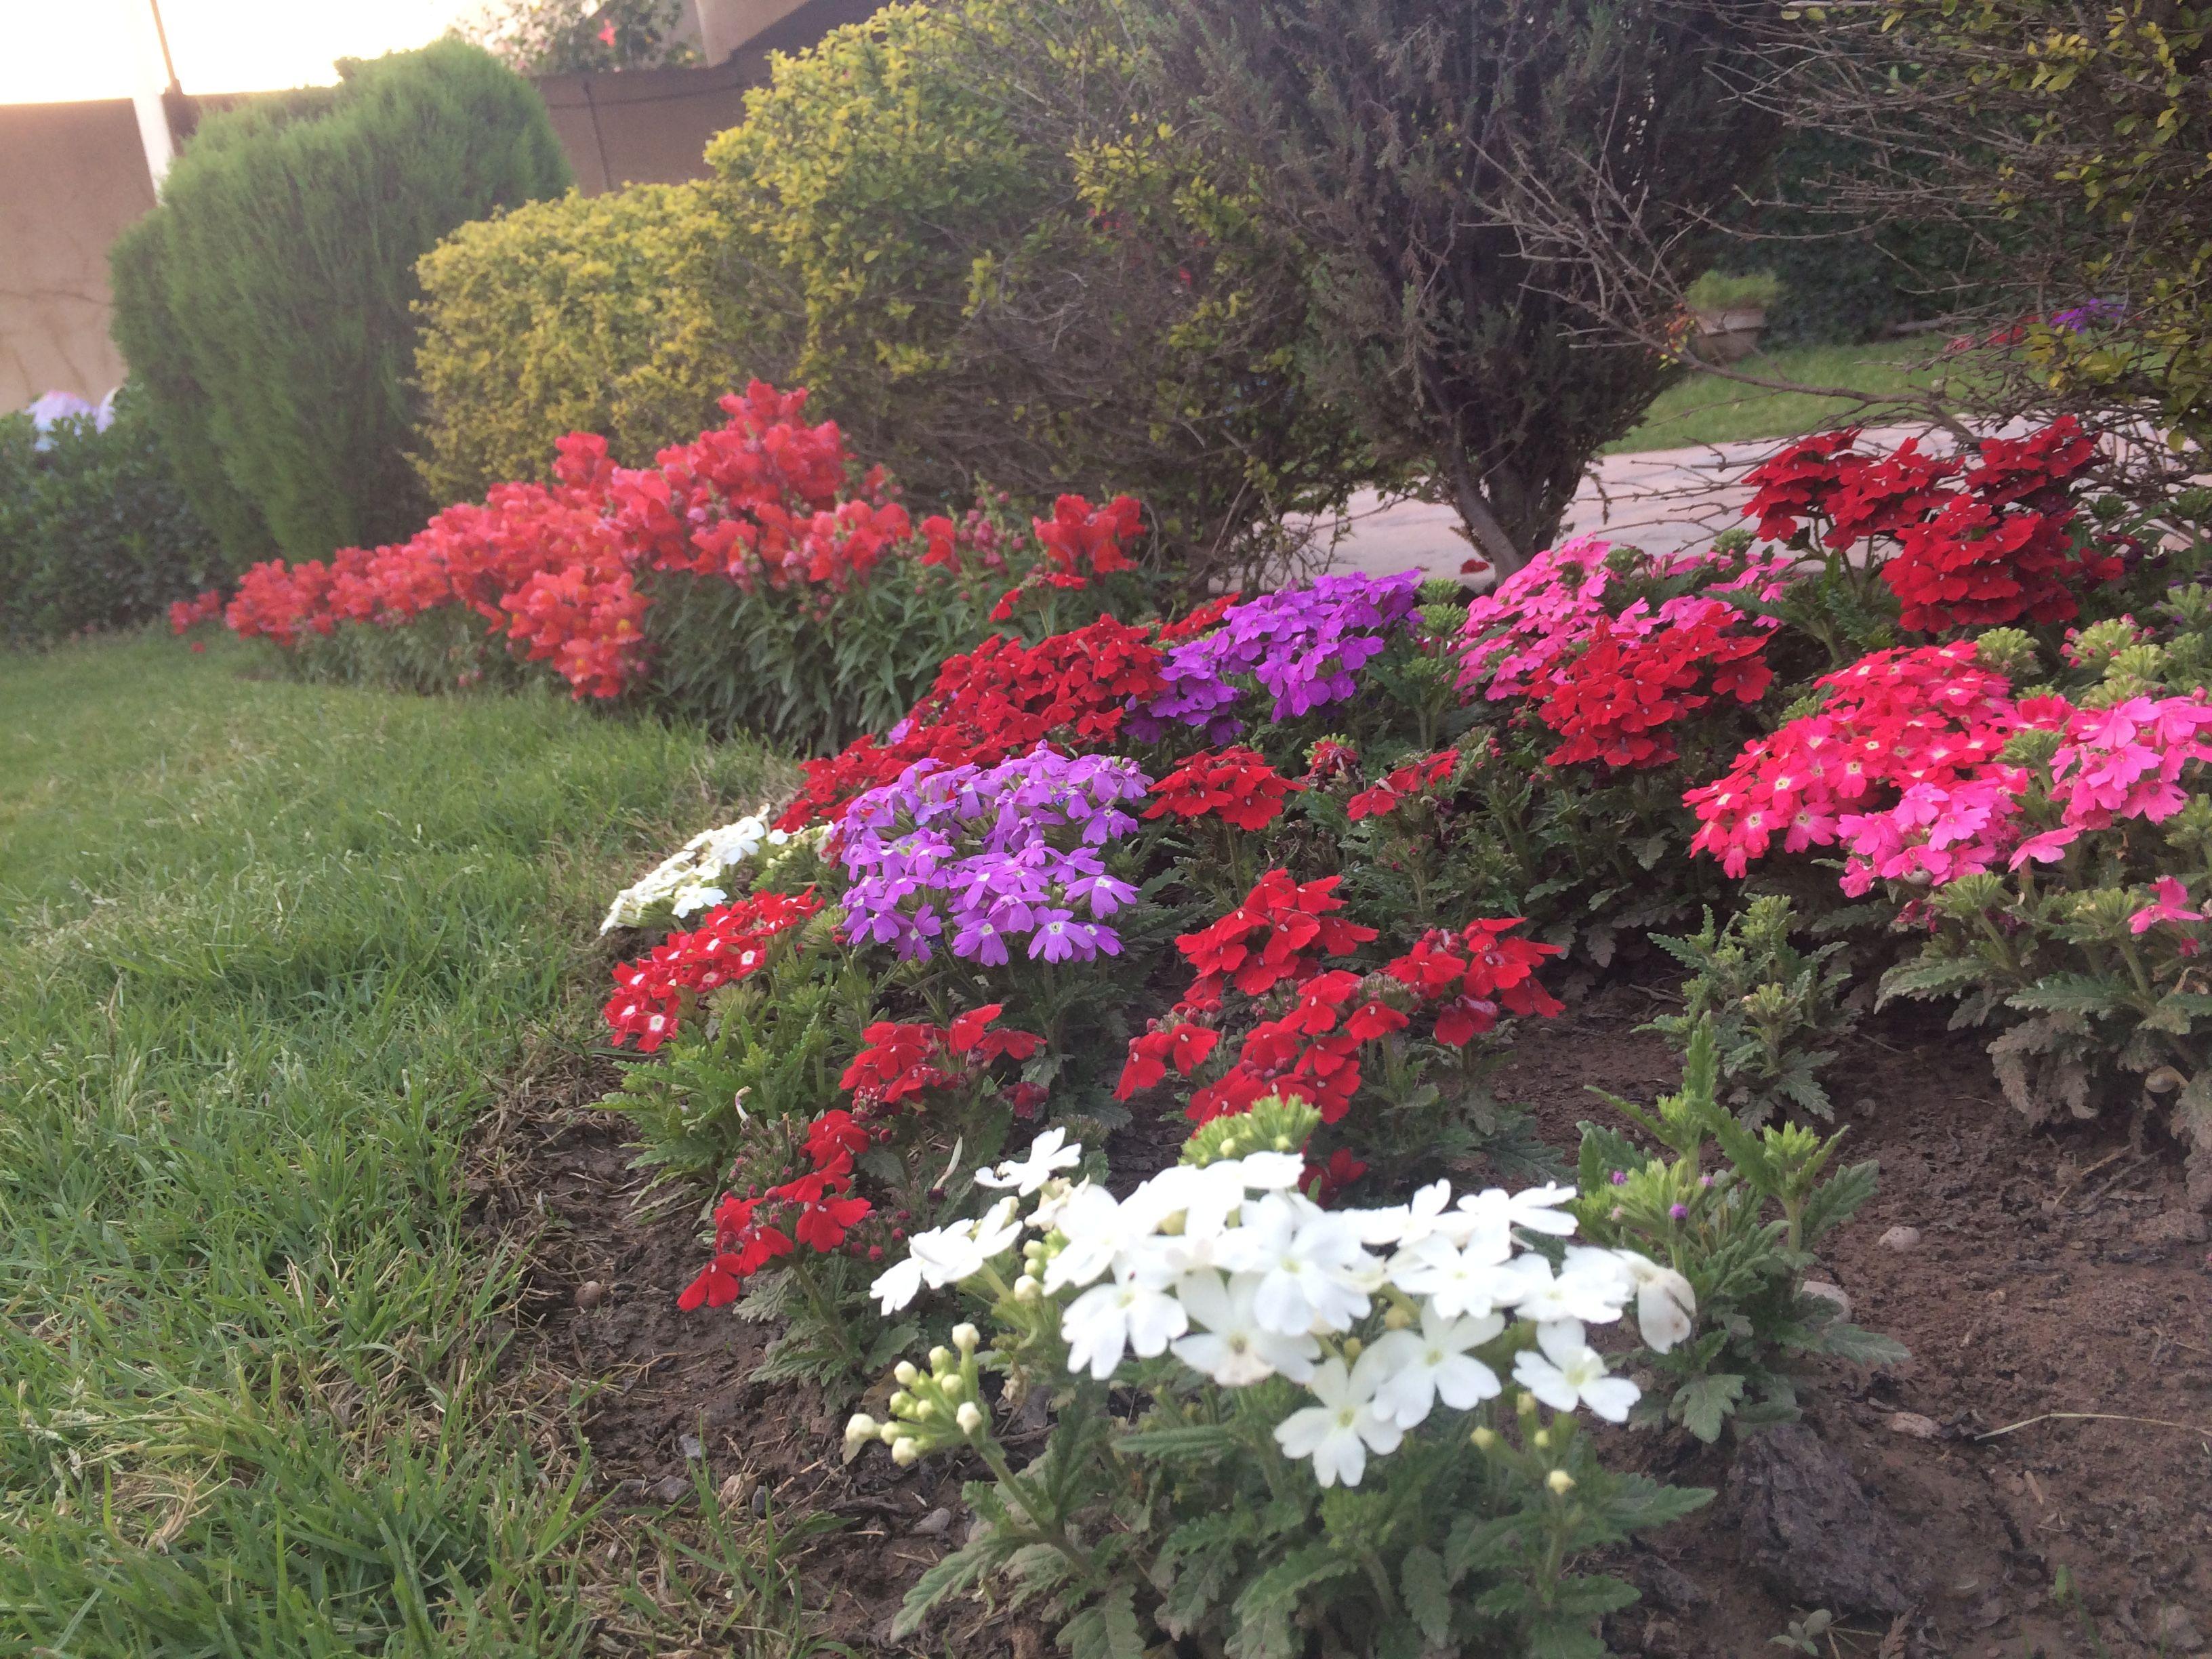 Pin by iriah sml on flowers pinterest flowers